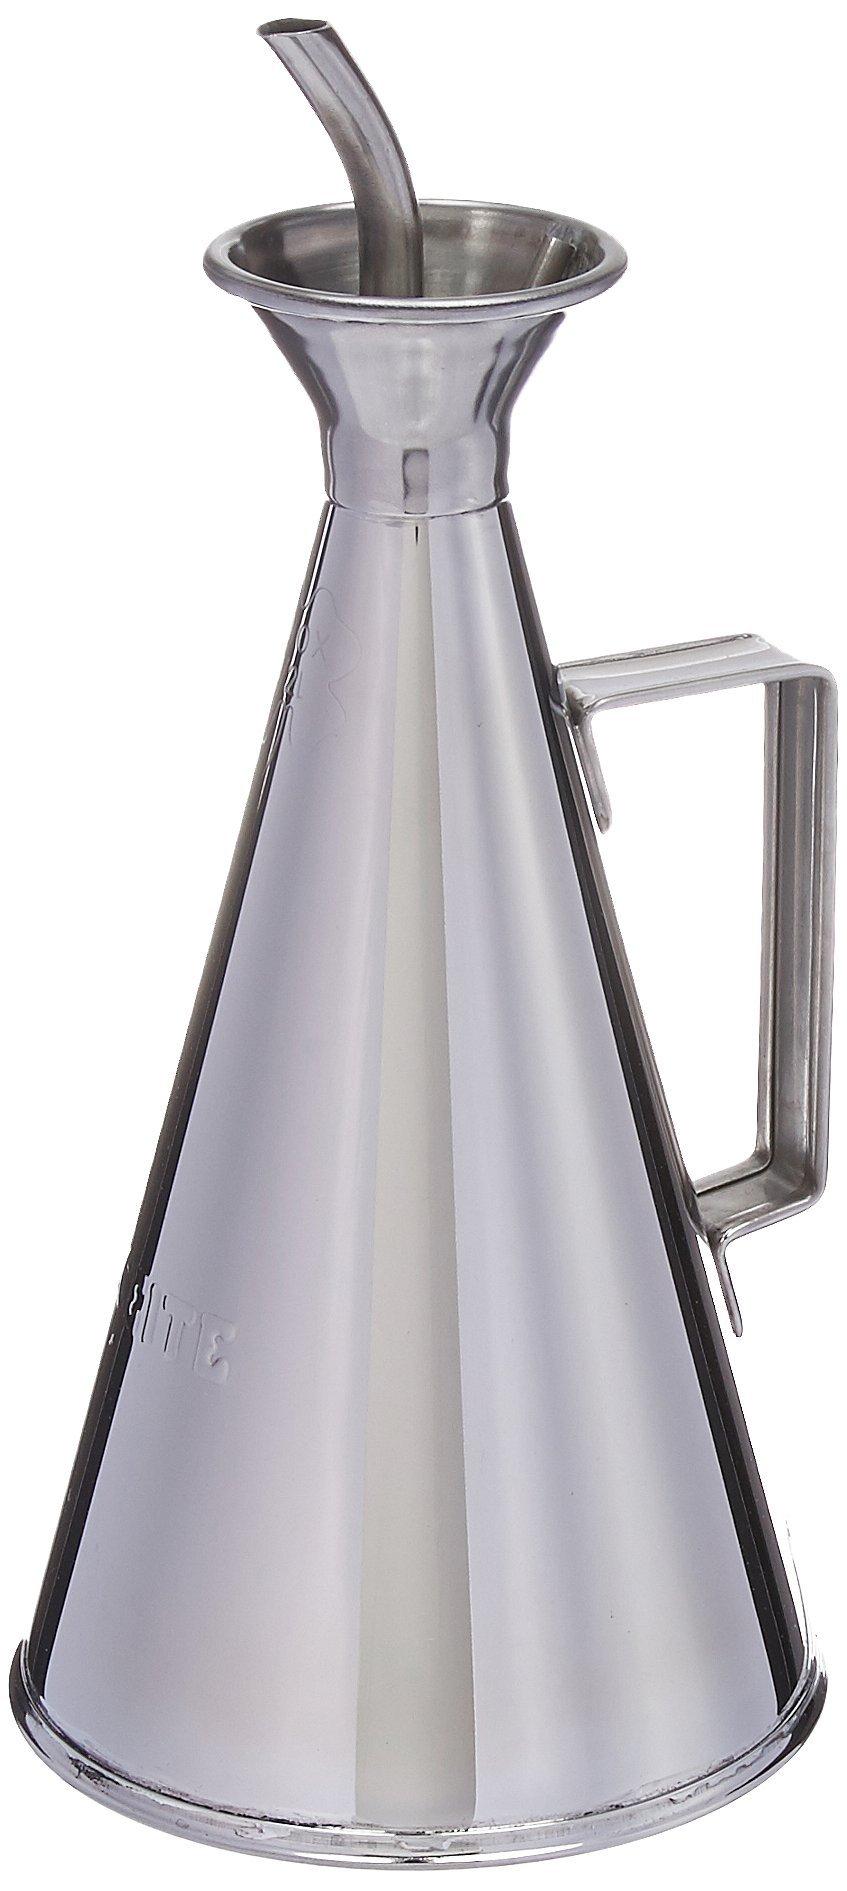 ½ Liter No Drip Olive Oil Dispenser (17 oz)